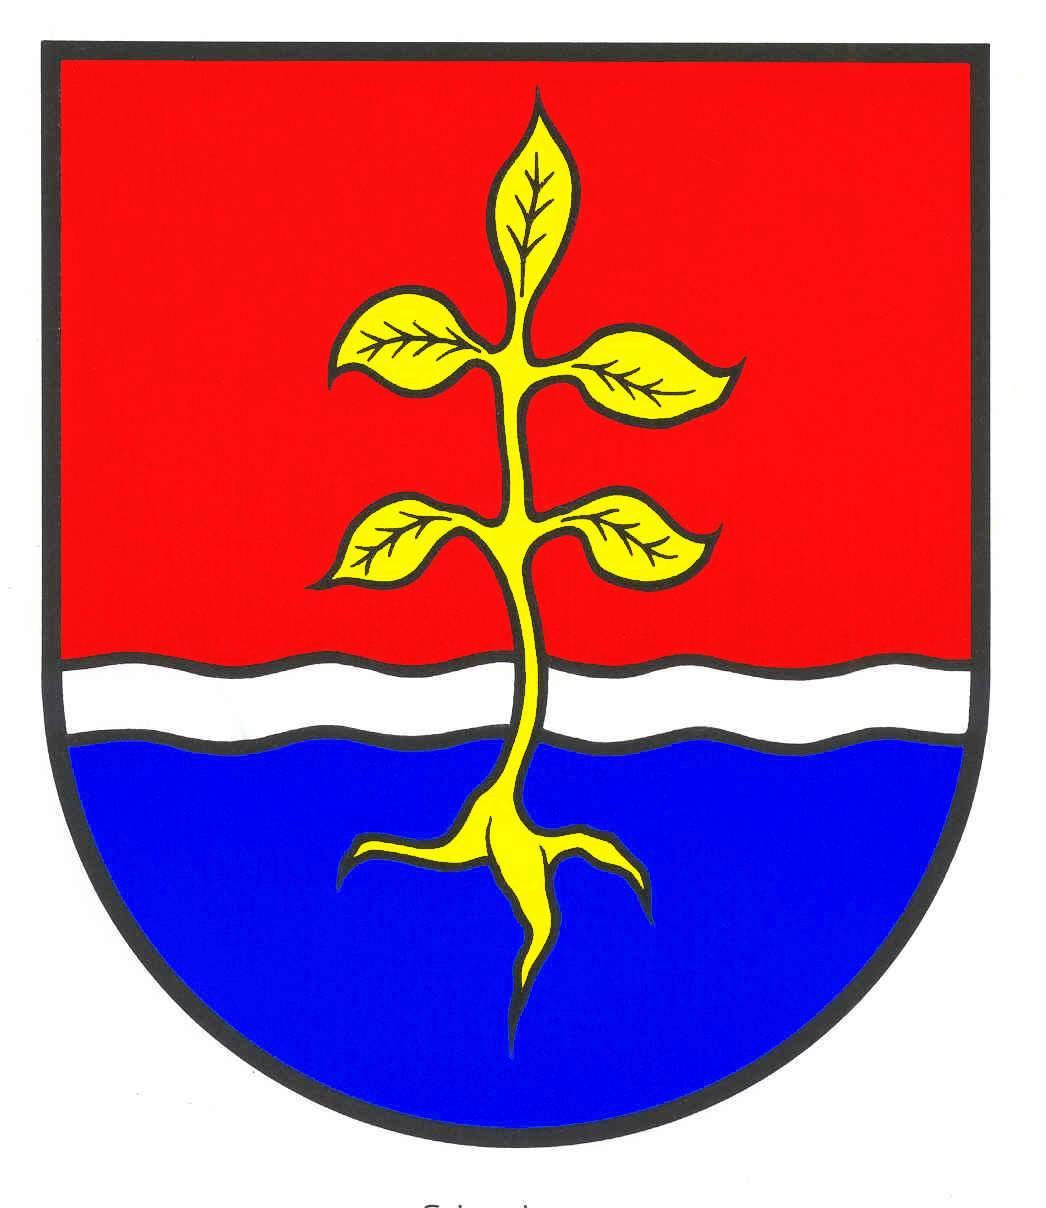 Wappen GemeindeSchmalensee, Kreis Segeberg